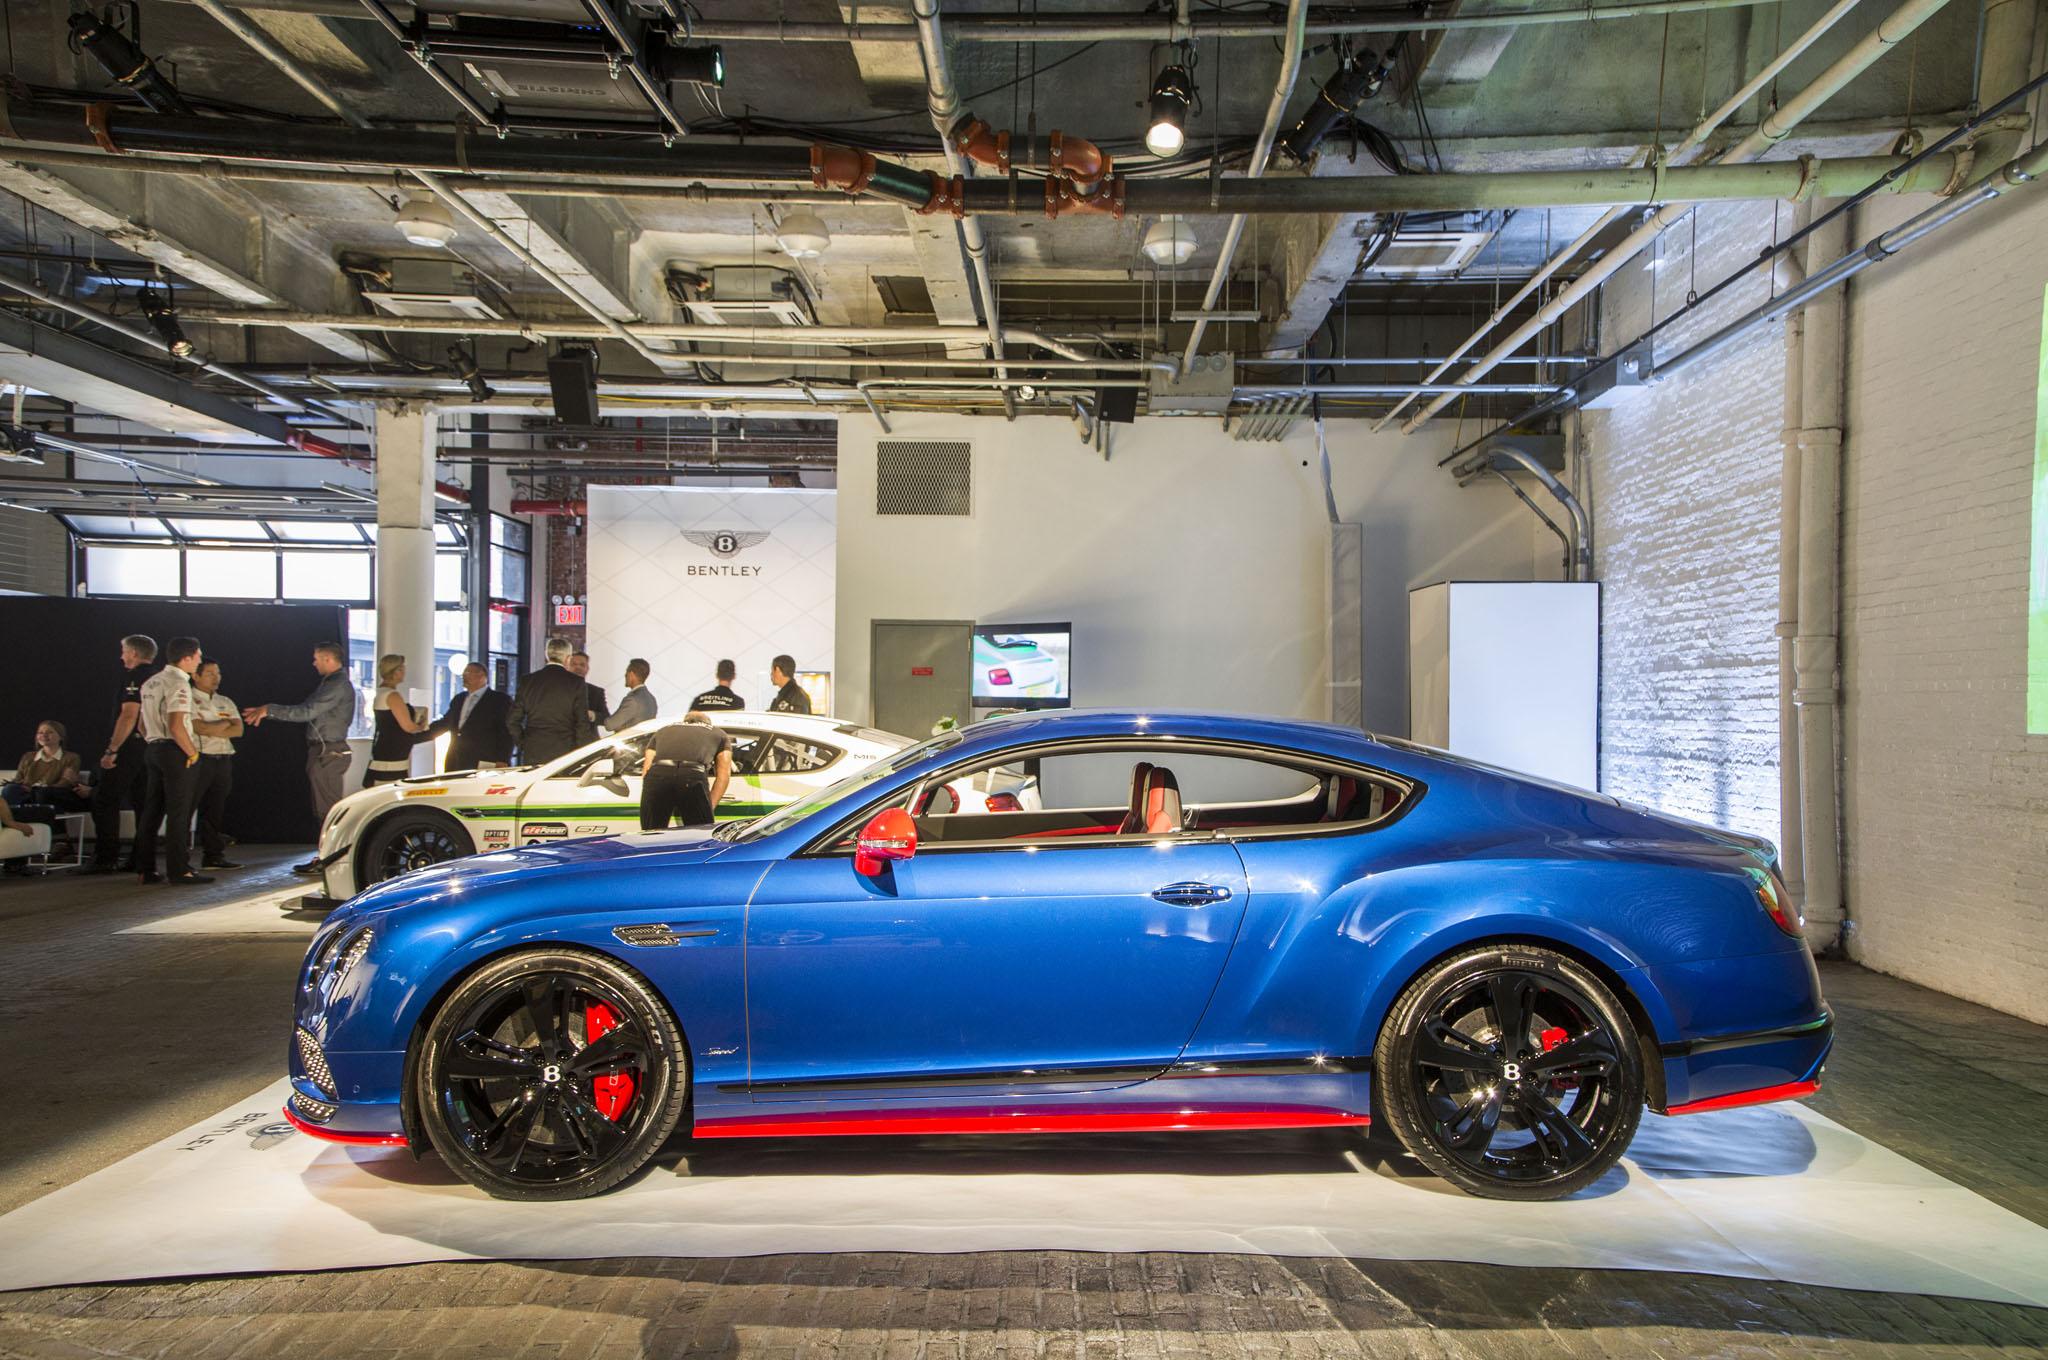 2017 Bentley Continental Gt Sd Side Look